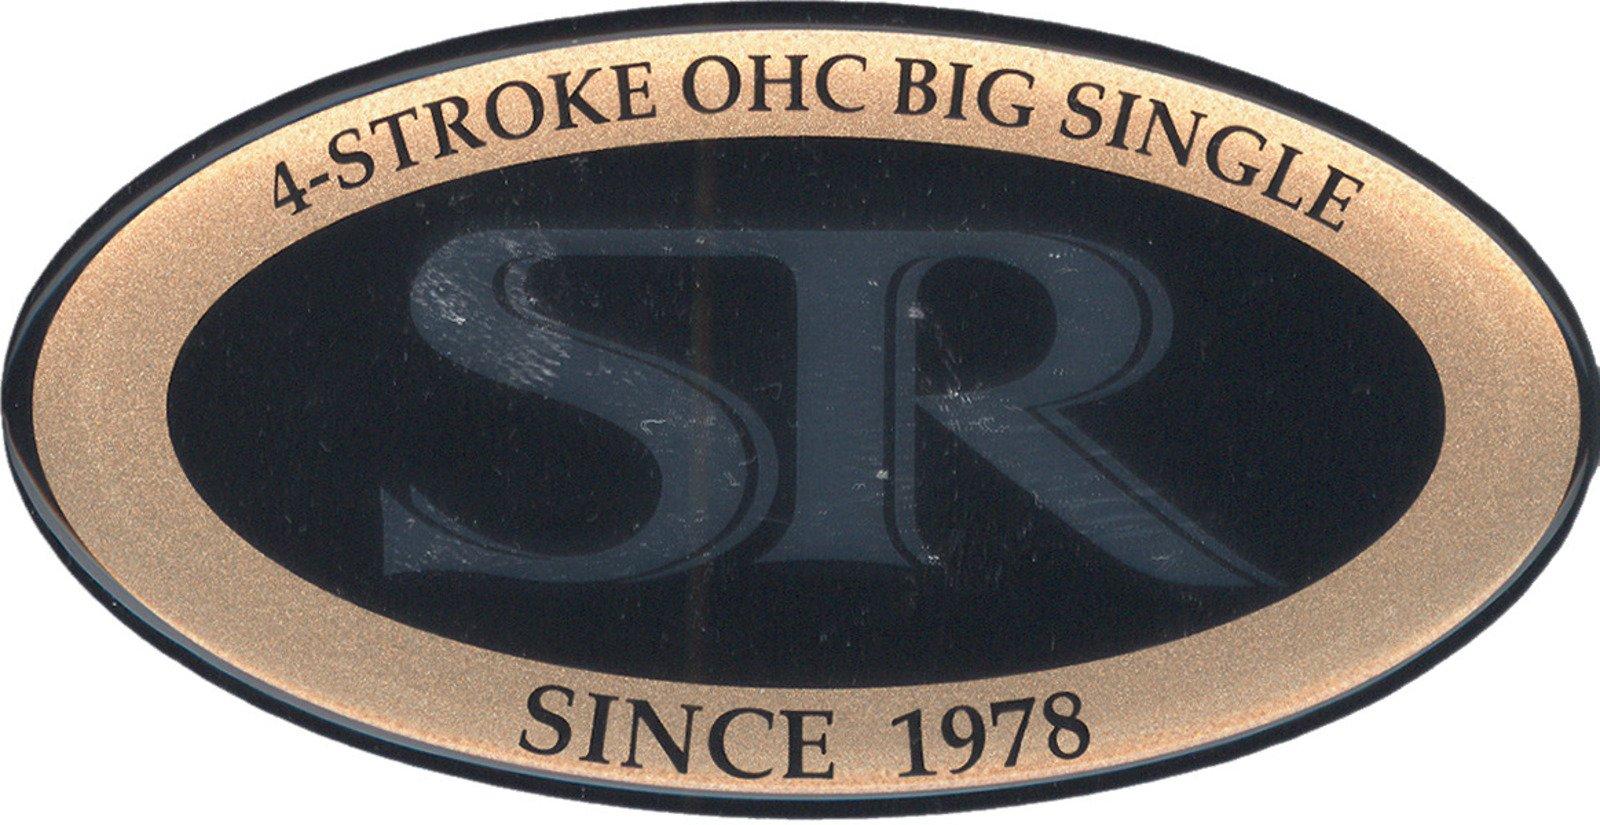 Yamaha SR500 SR 4-Stroke OHC Big Single Since 1978Gold Chrome and Black Sticker Decal 29317